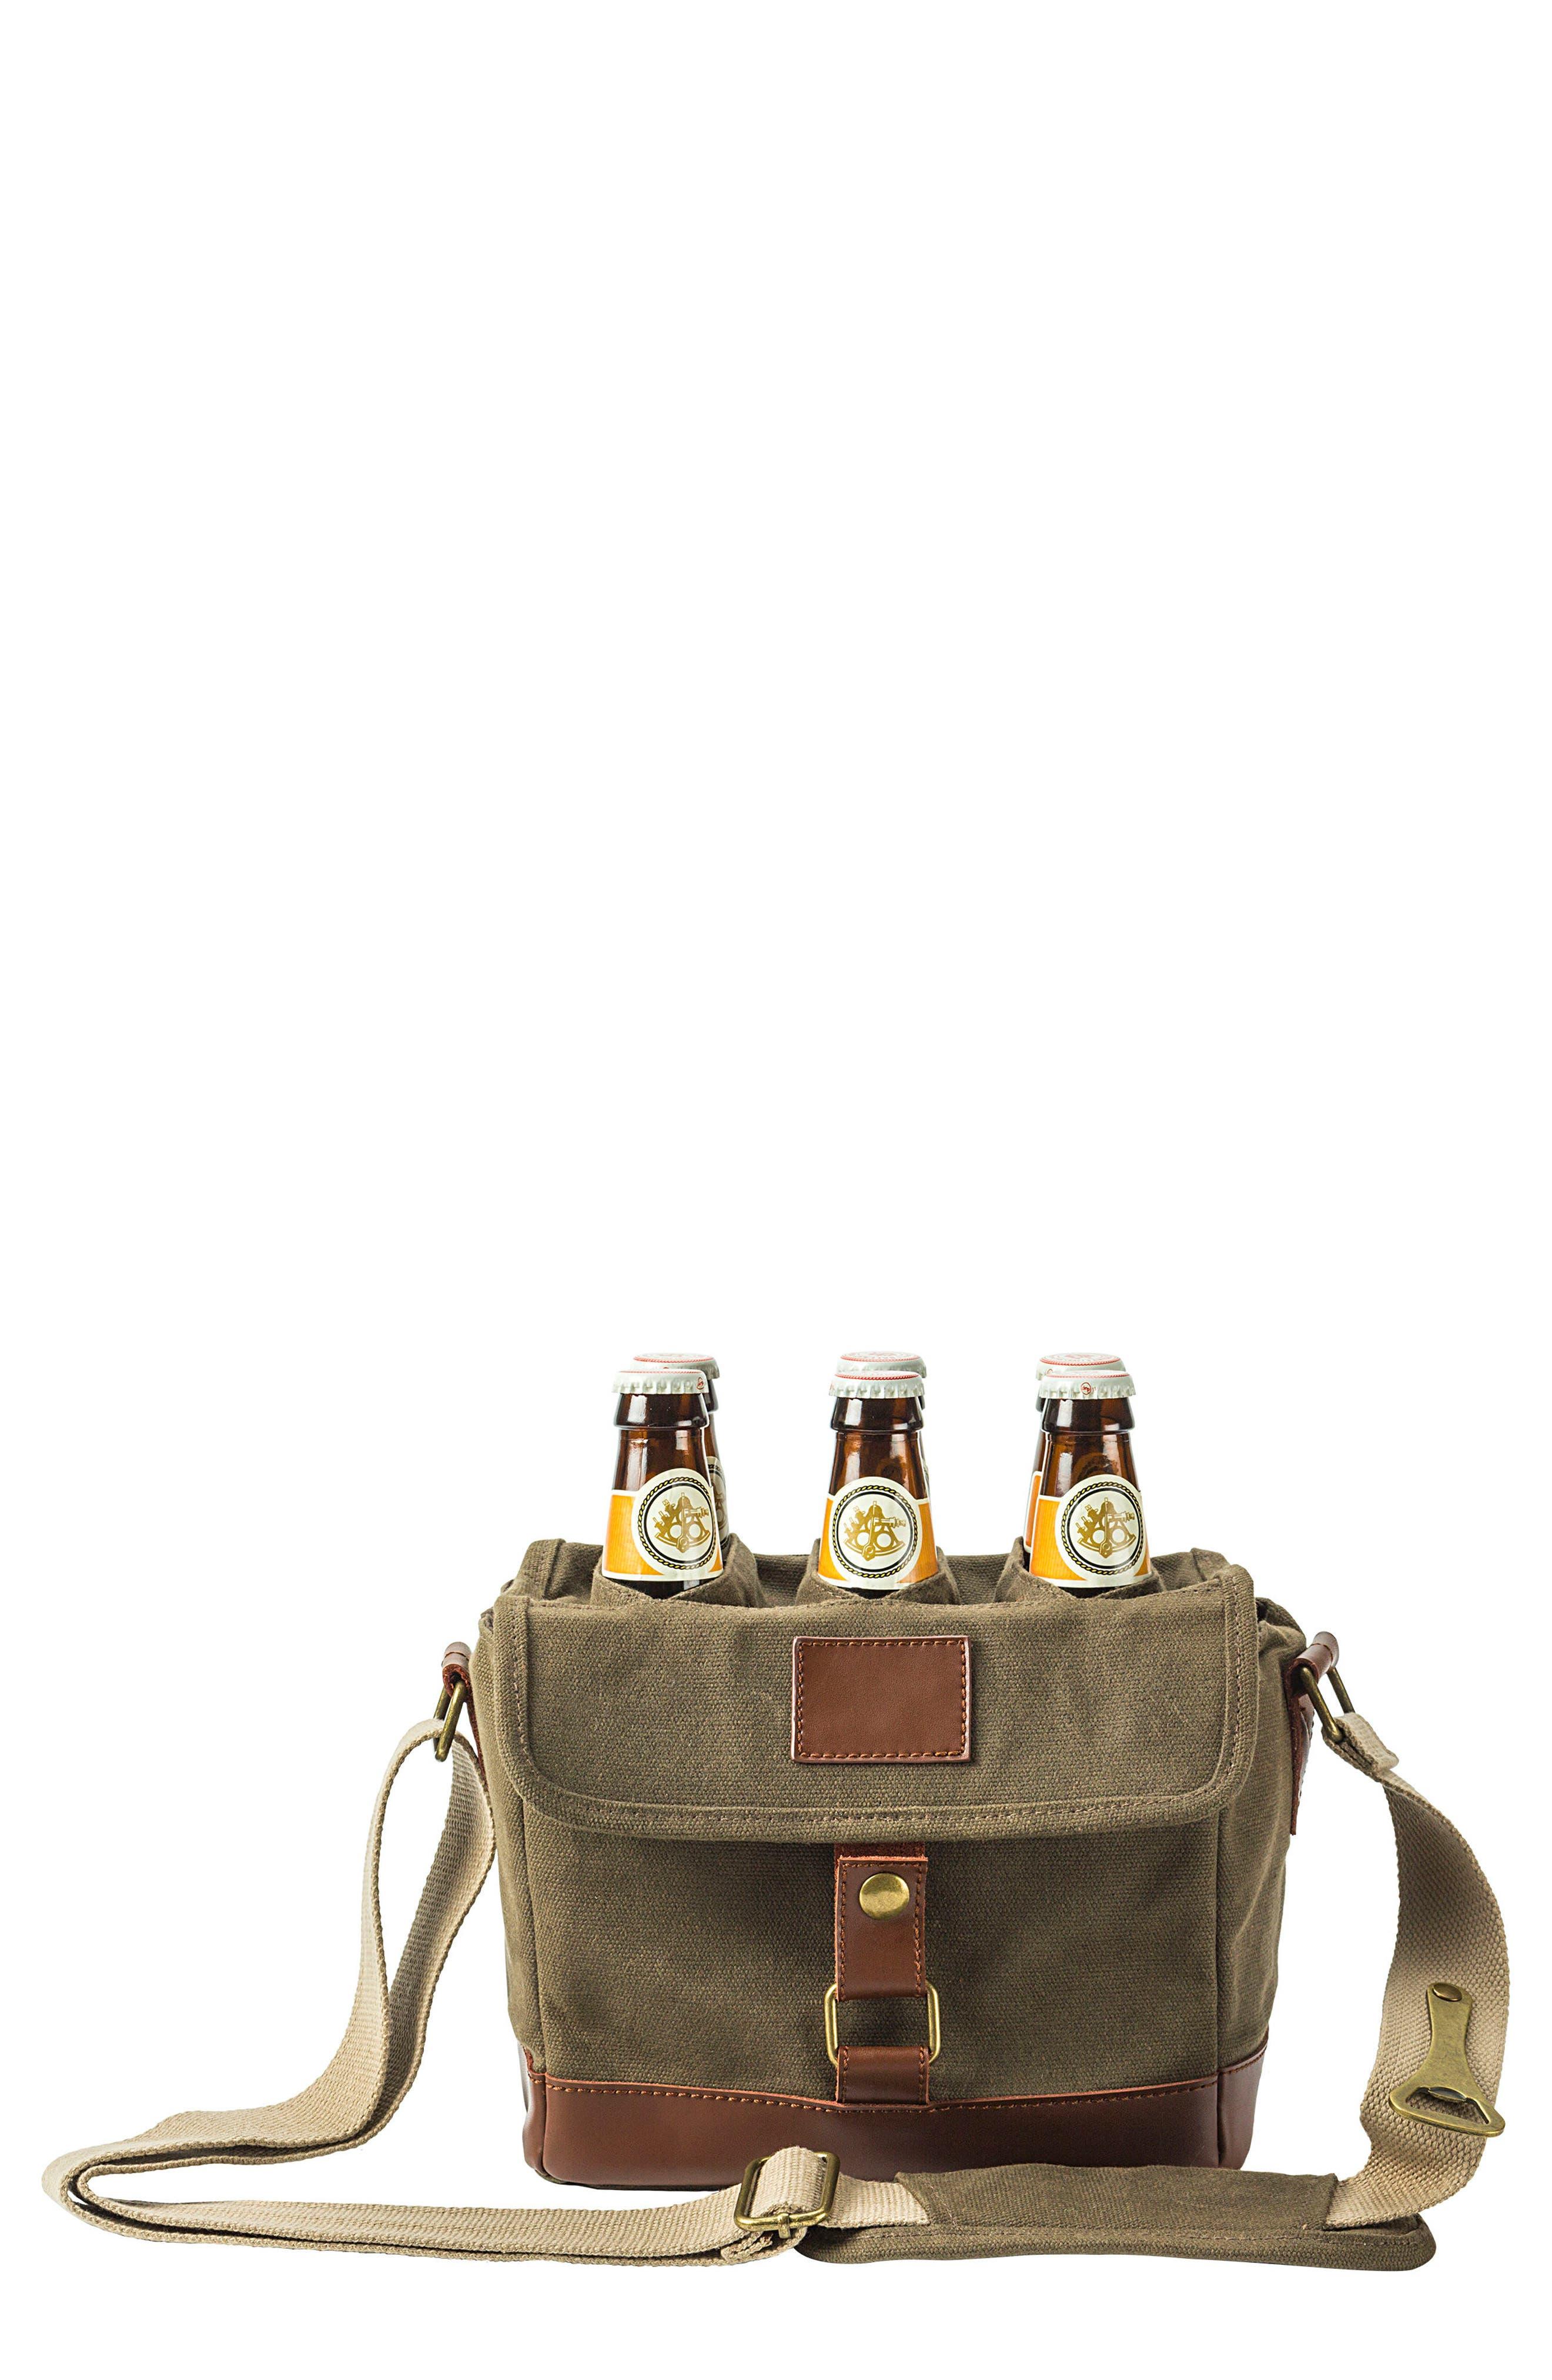 Main Image - Cathy's Concepts Monogram 6-Bottle Beer Cooler